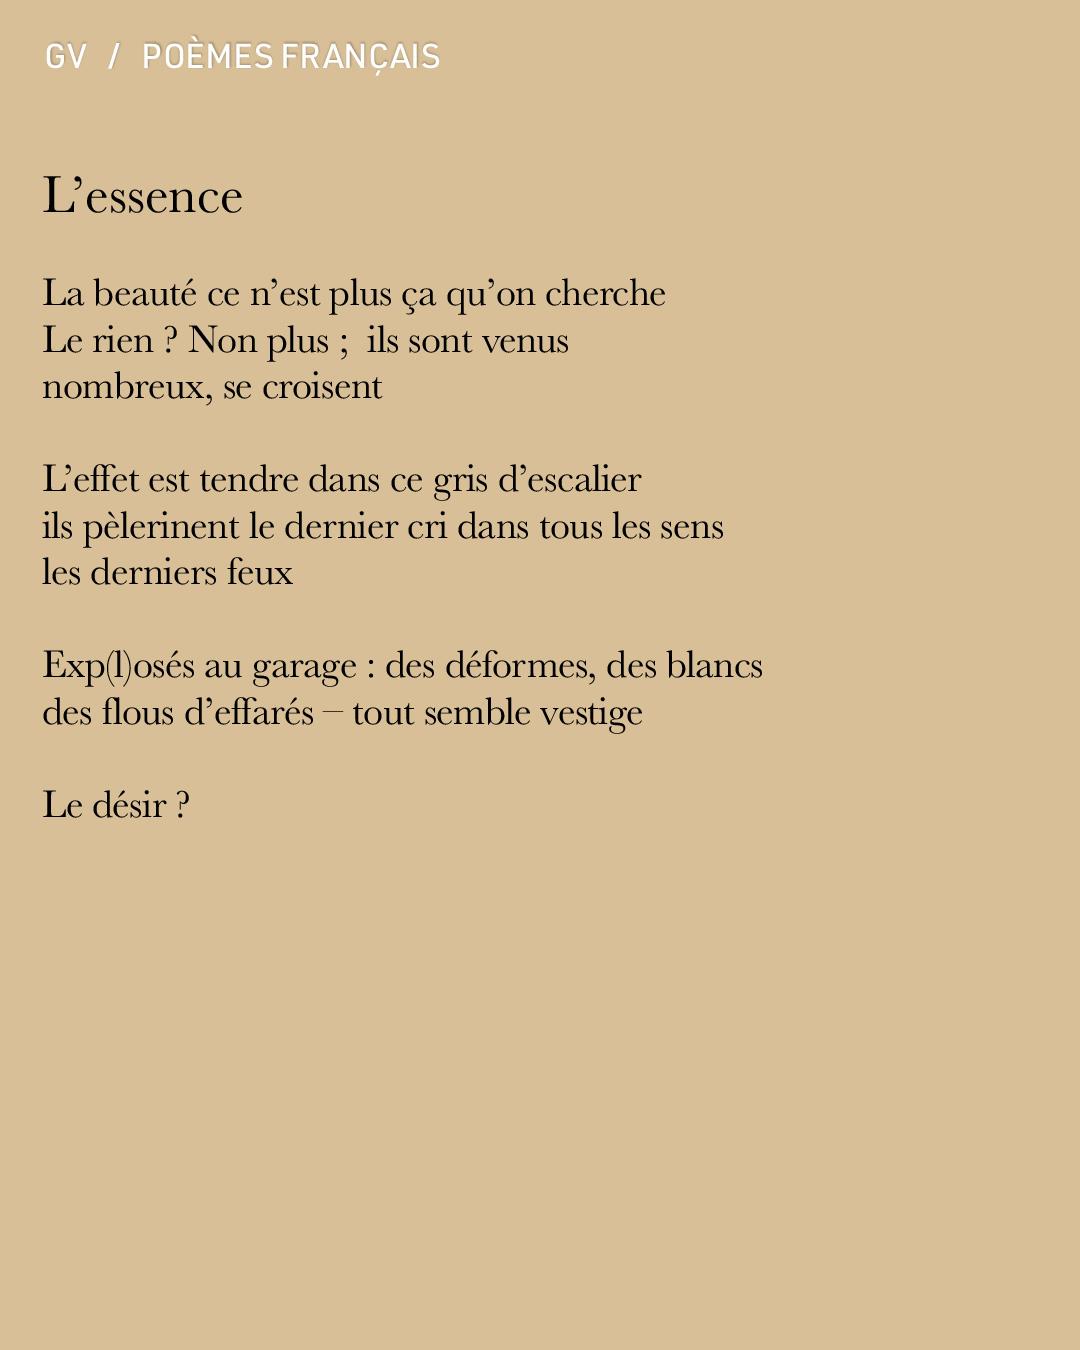 Gvion-PoemsA-lessence.jpg